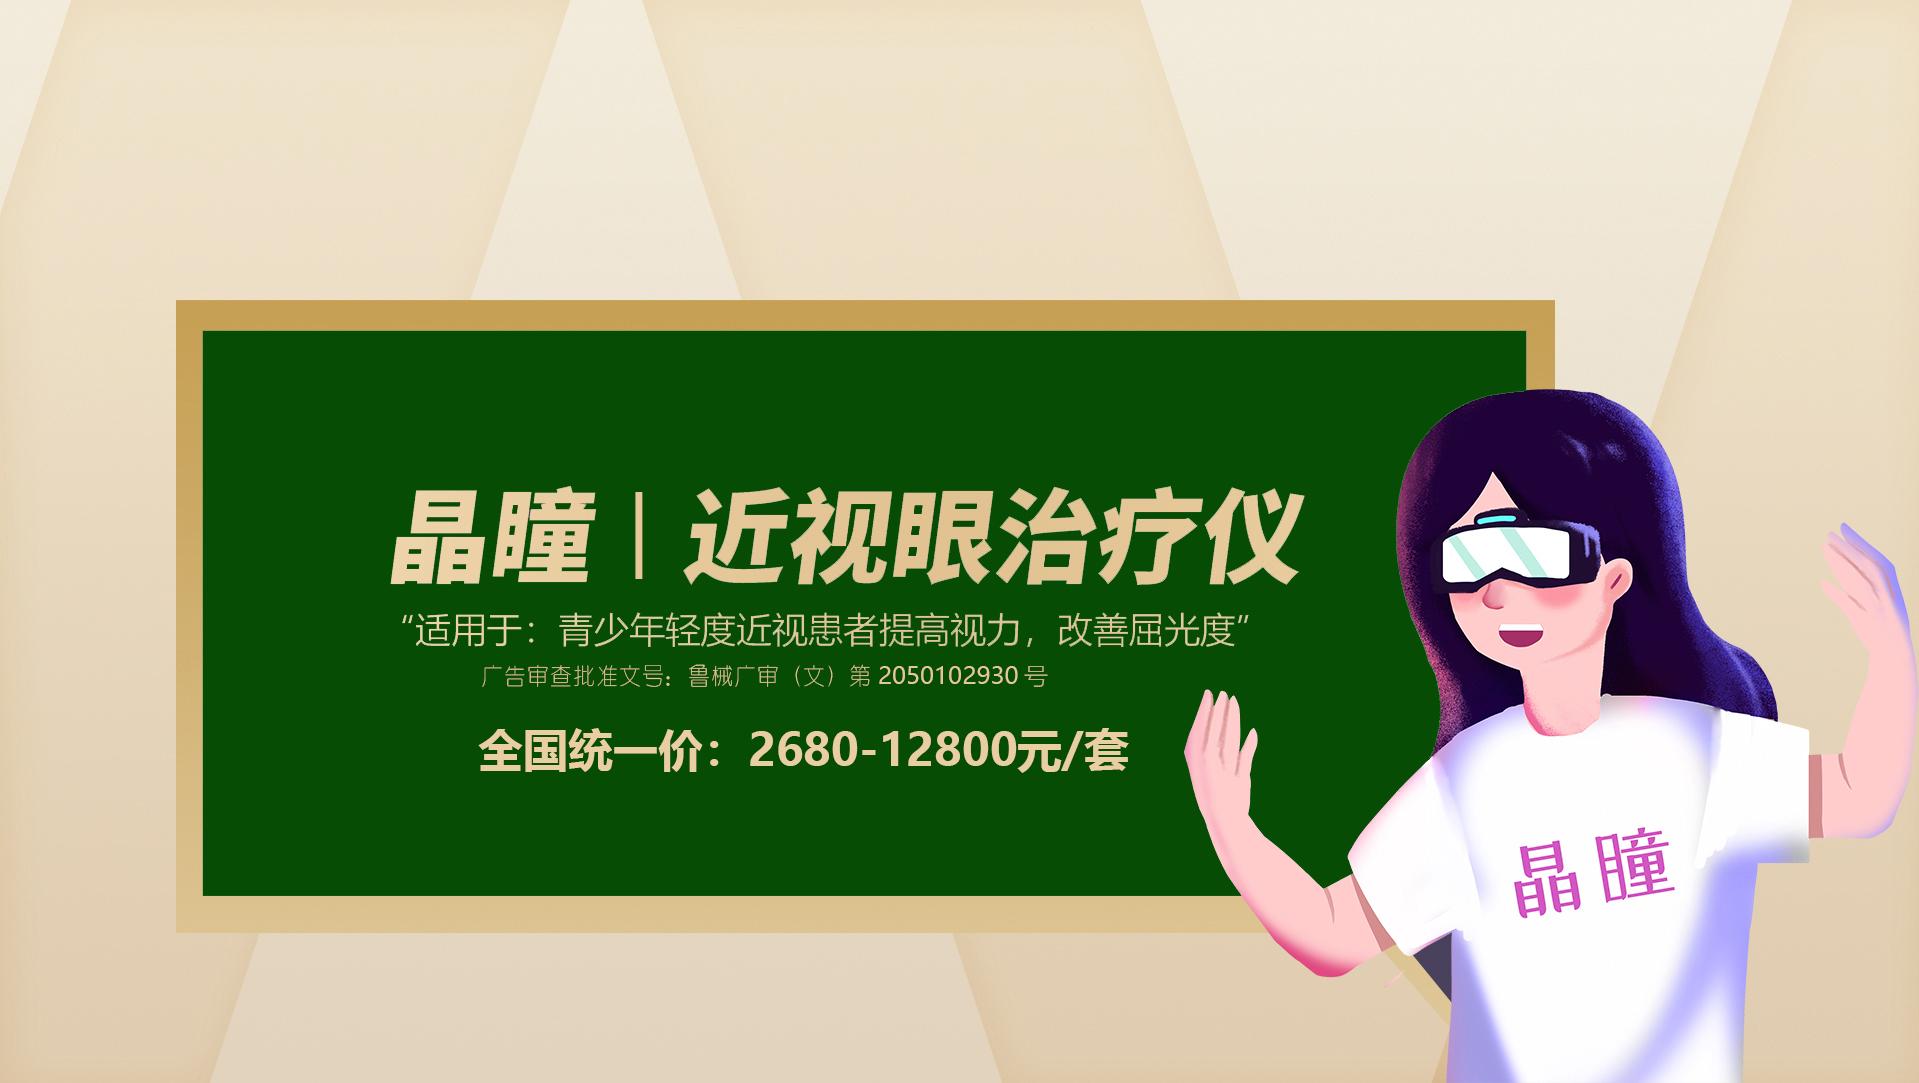 http://www.ytdehechang.com/data/upload/202104/20210410103259_446.jpg